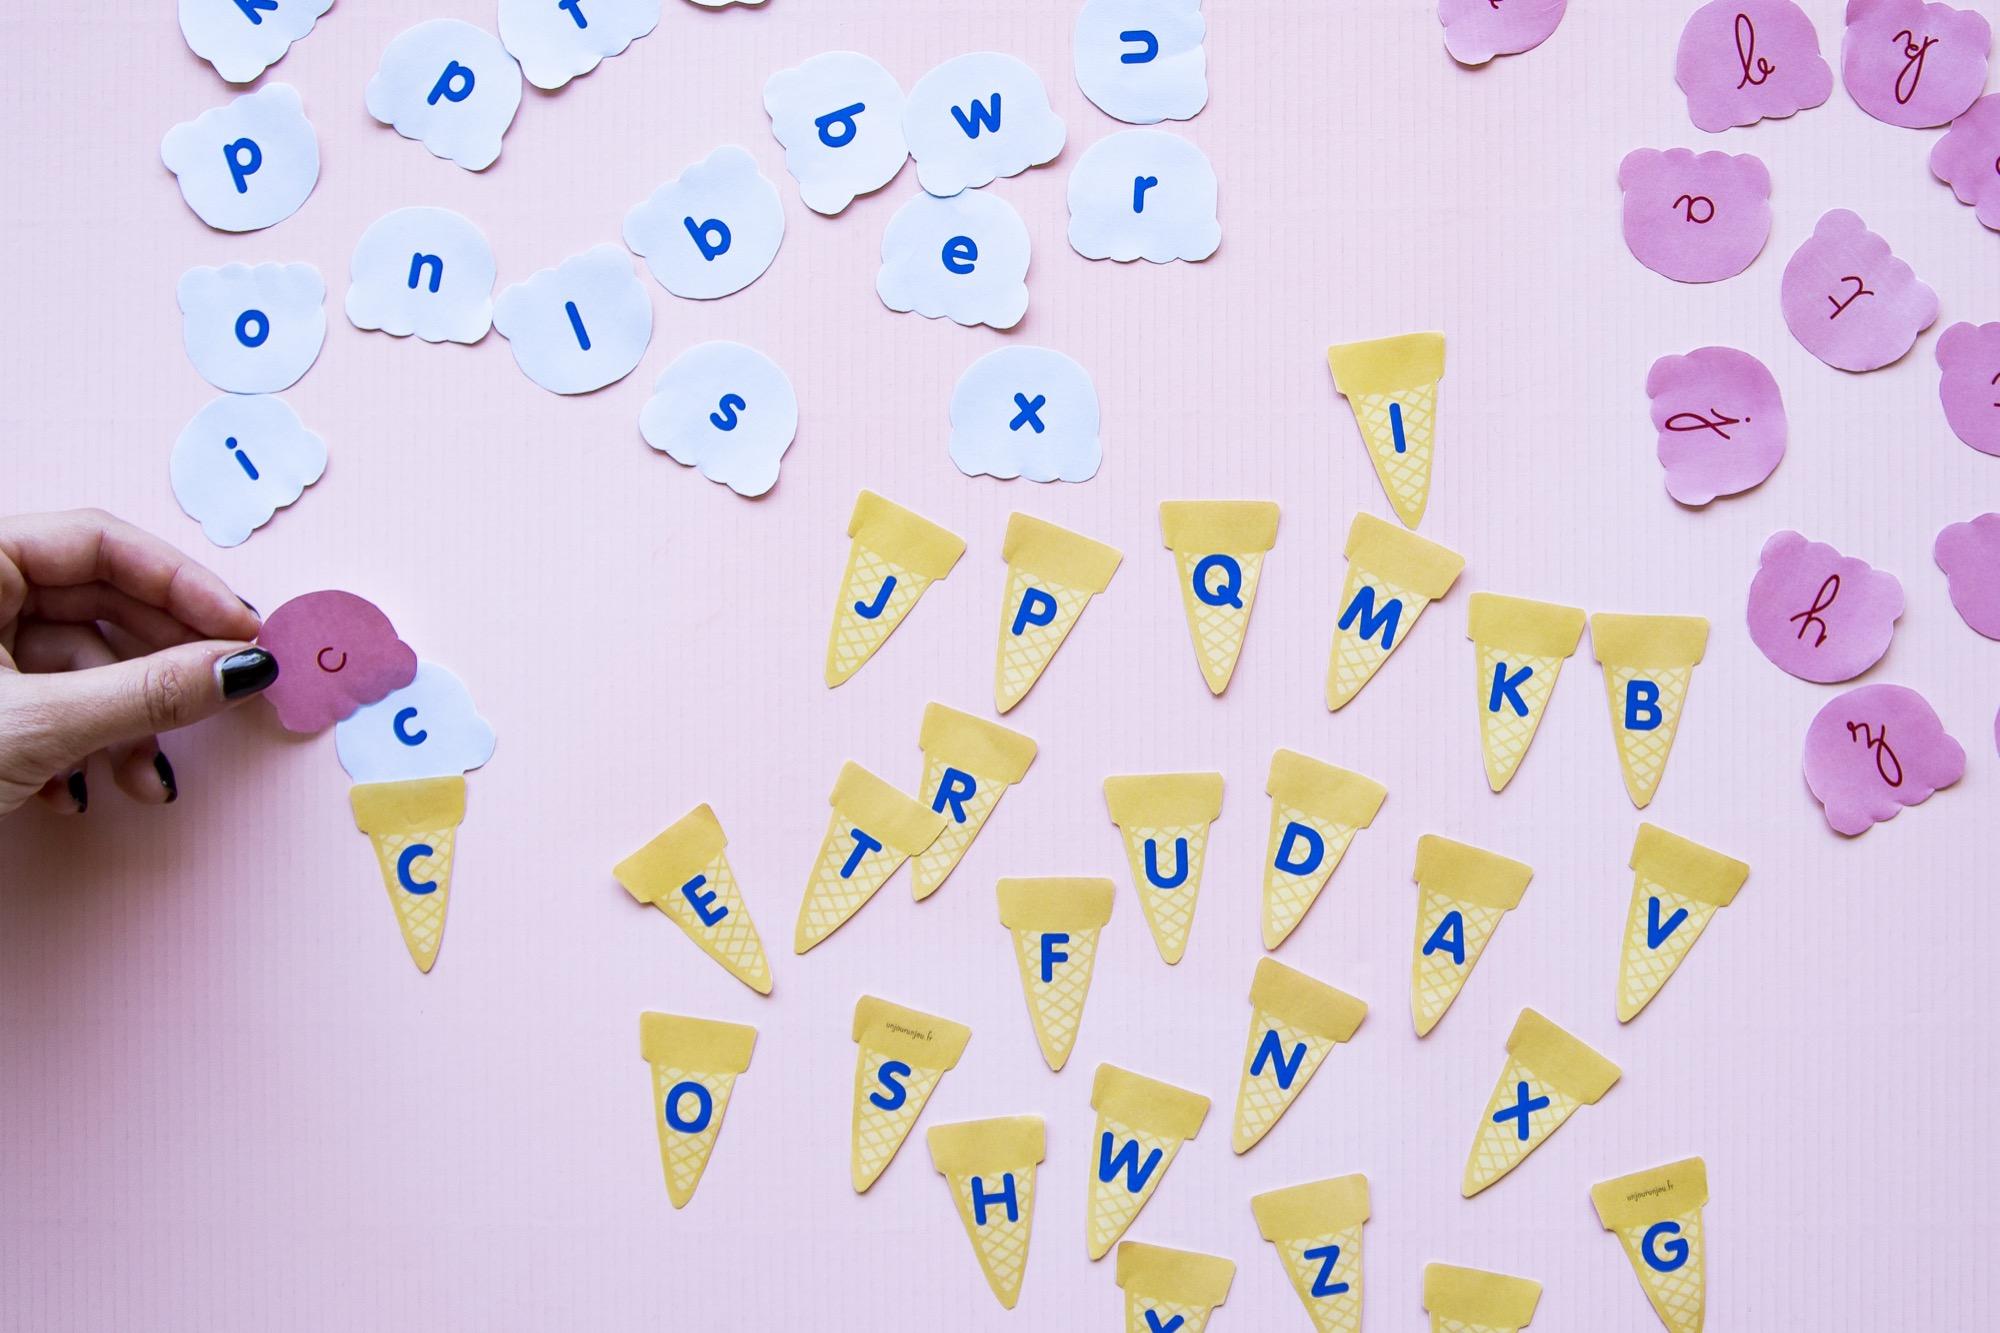 Correspondance alphabet glaces - étape 4